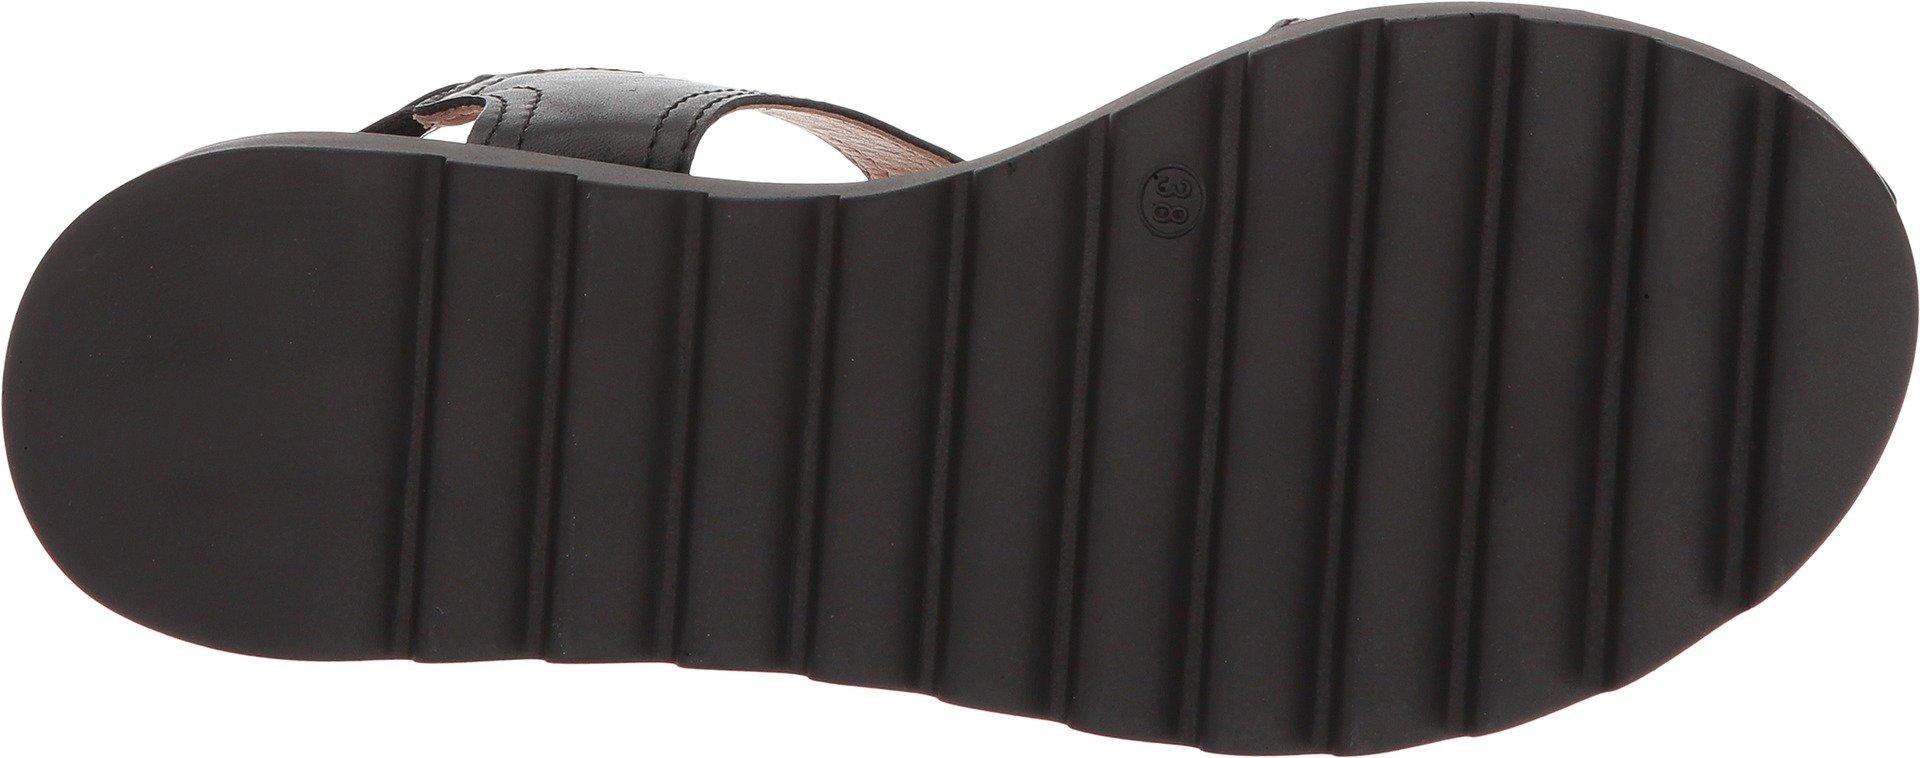 Love Moschino Women's Mesh Sandal Black 35 M EU by Love Moschino (Image #3)